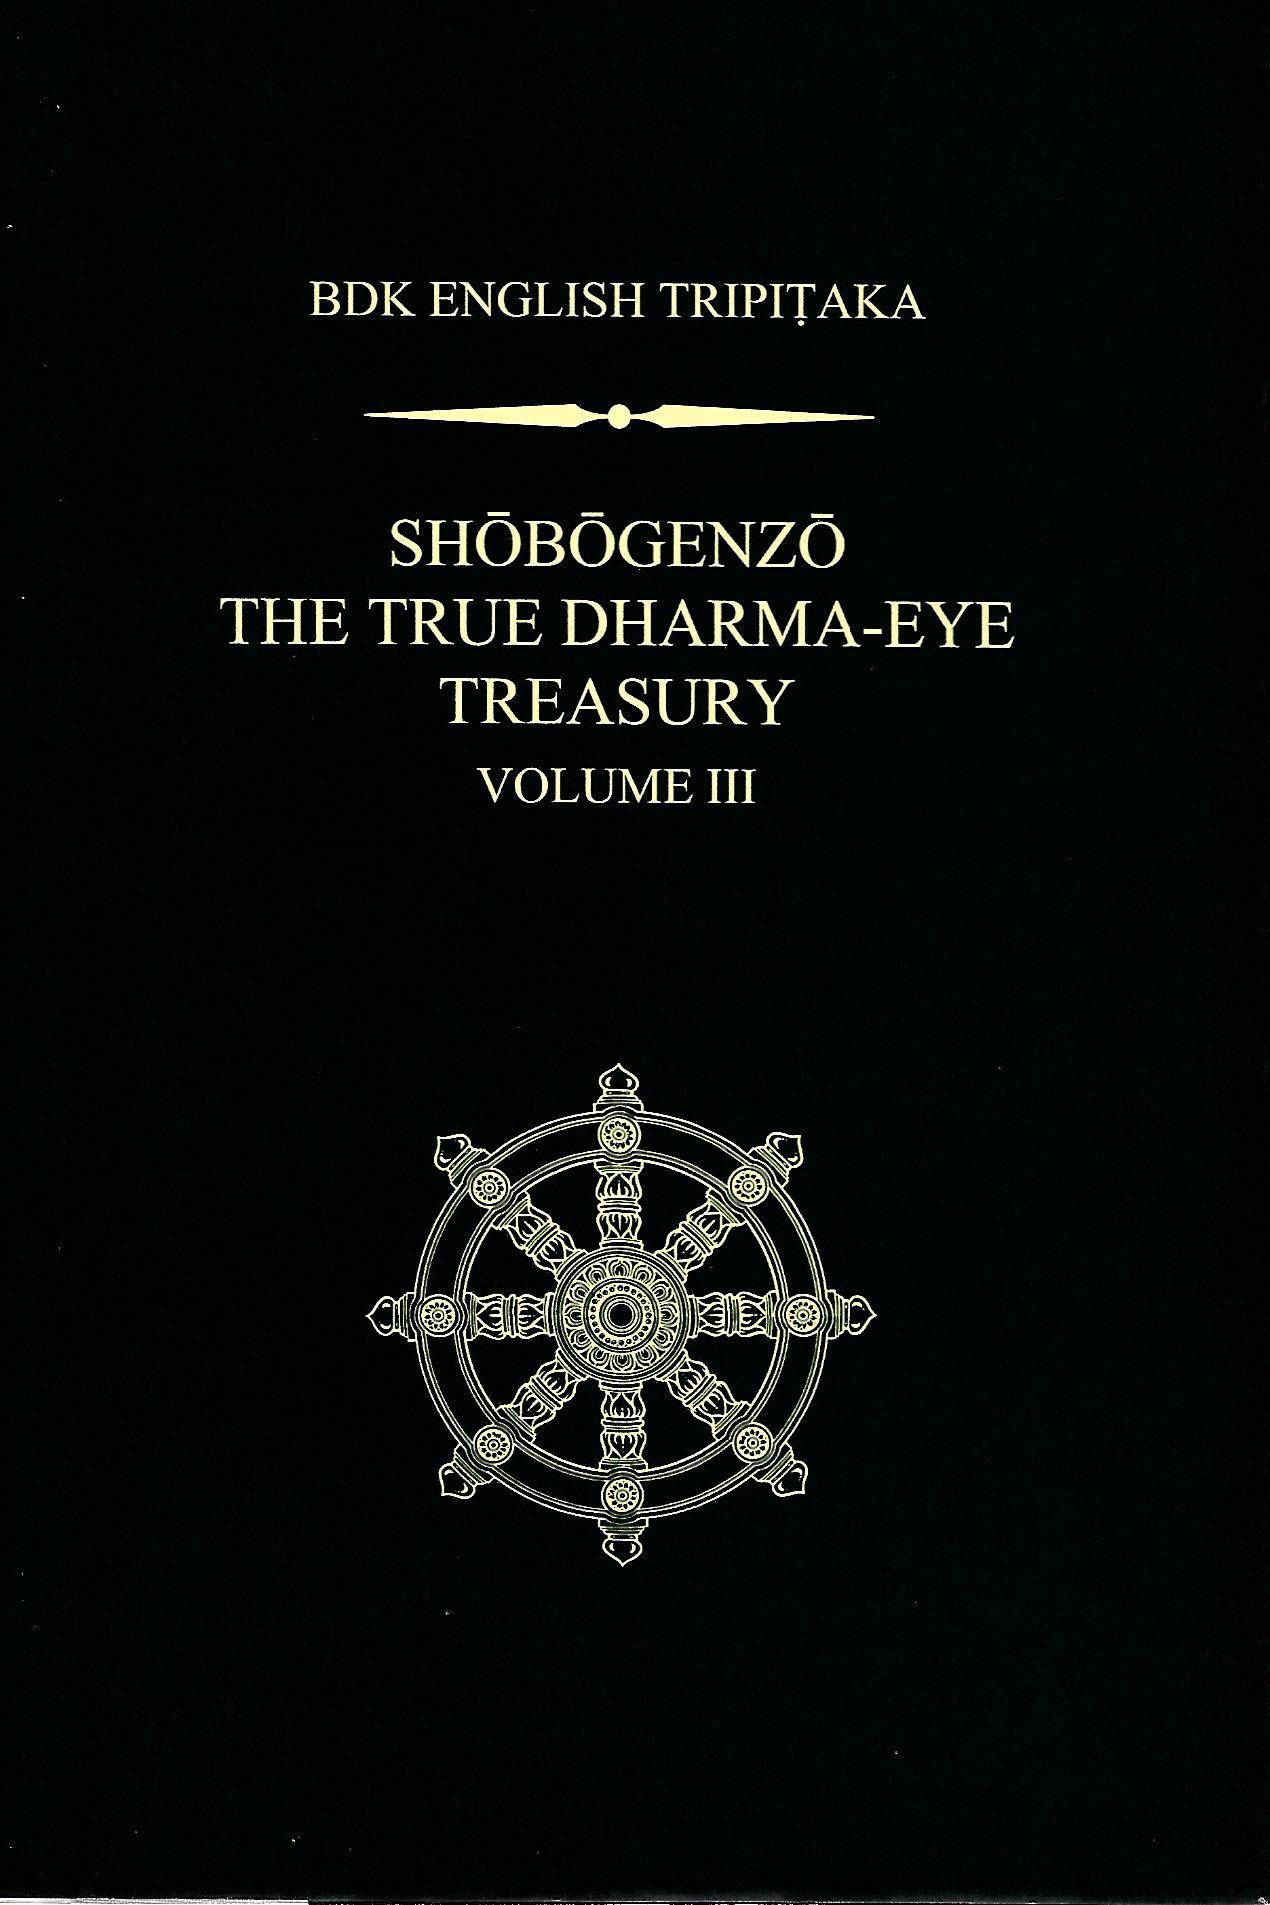 Shobogenzo Nishijima and Cross Volume 3 cover art